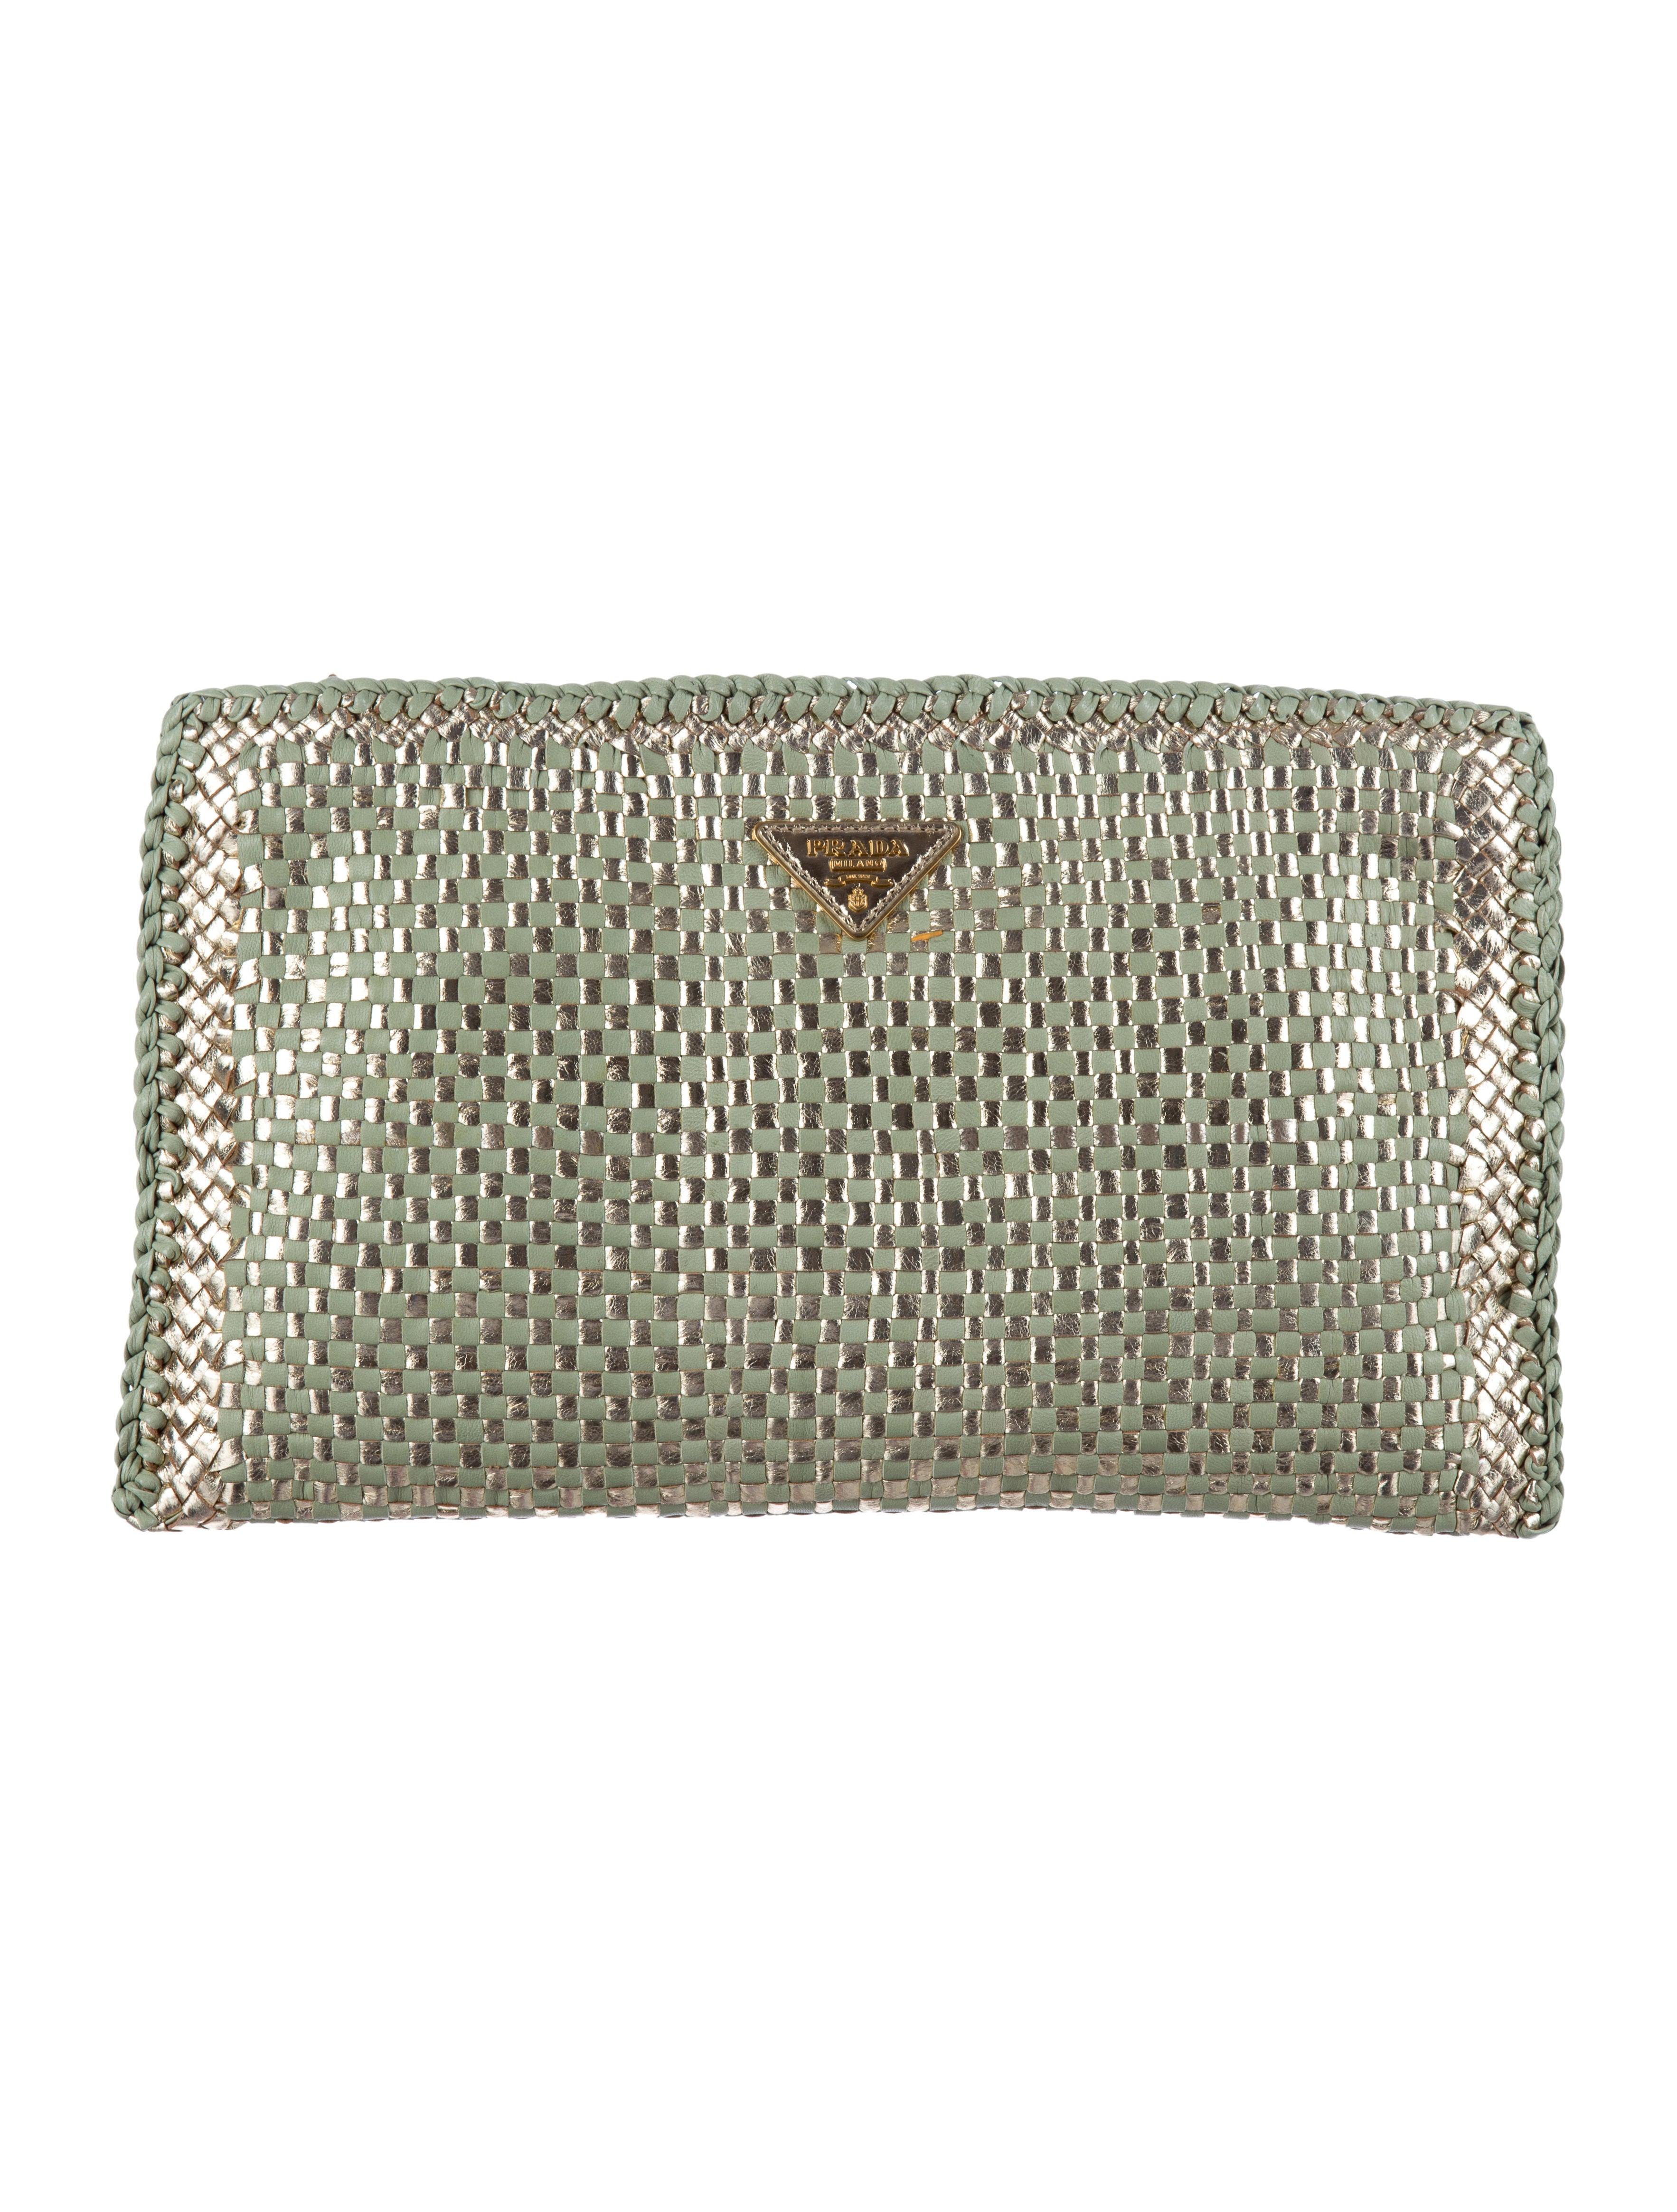 dbaeb398088d Prada Metallic Madras Clutch w/ Tags - Handbags - PRA81786 | The ... prada  bag cheap - PRADA Woven Goatskin Madras Zip Around Wallet Nero Black